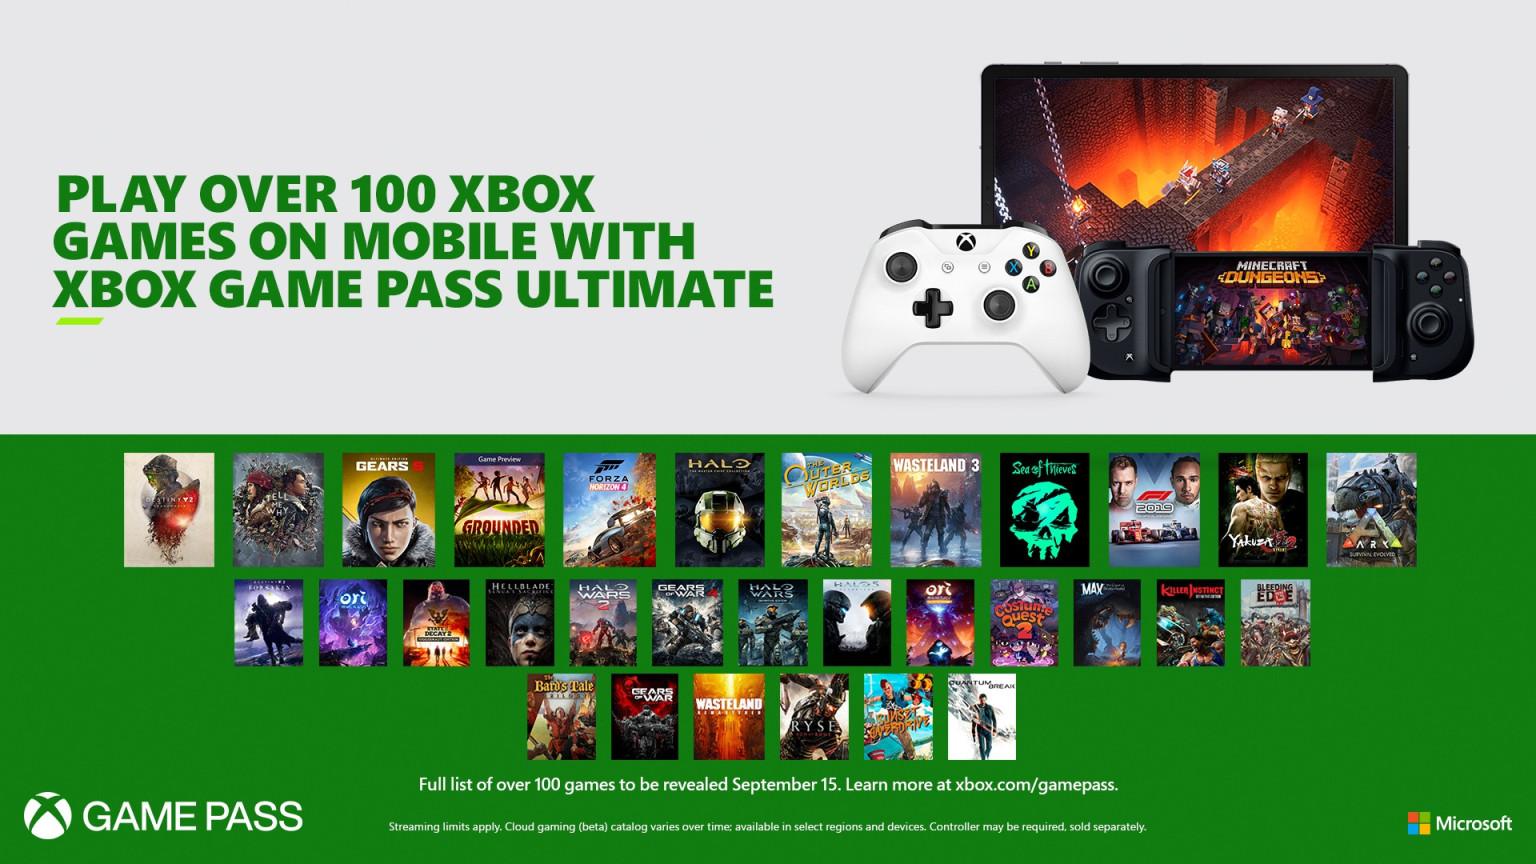 Microsoft Project xCloud Gaming